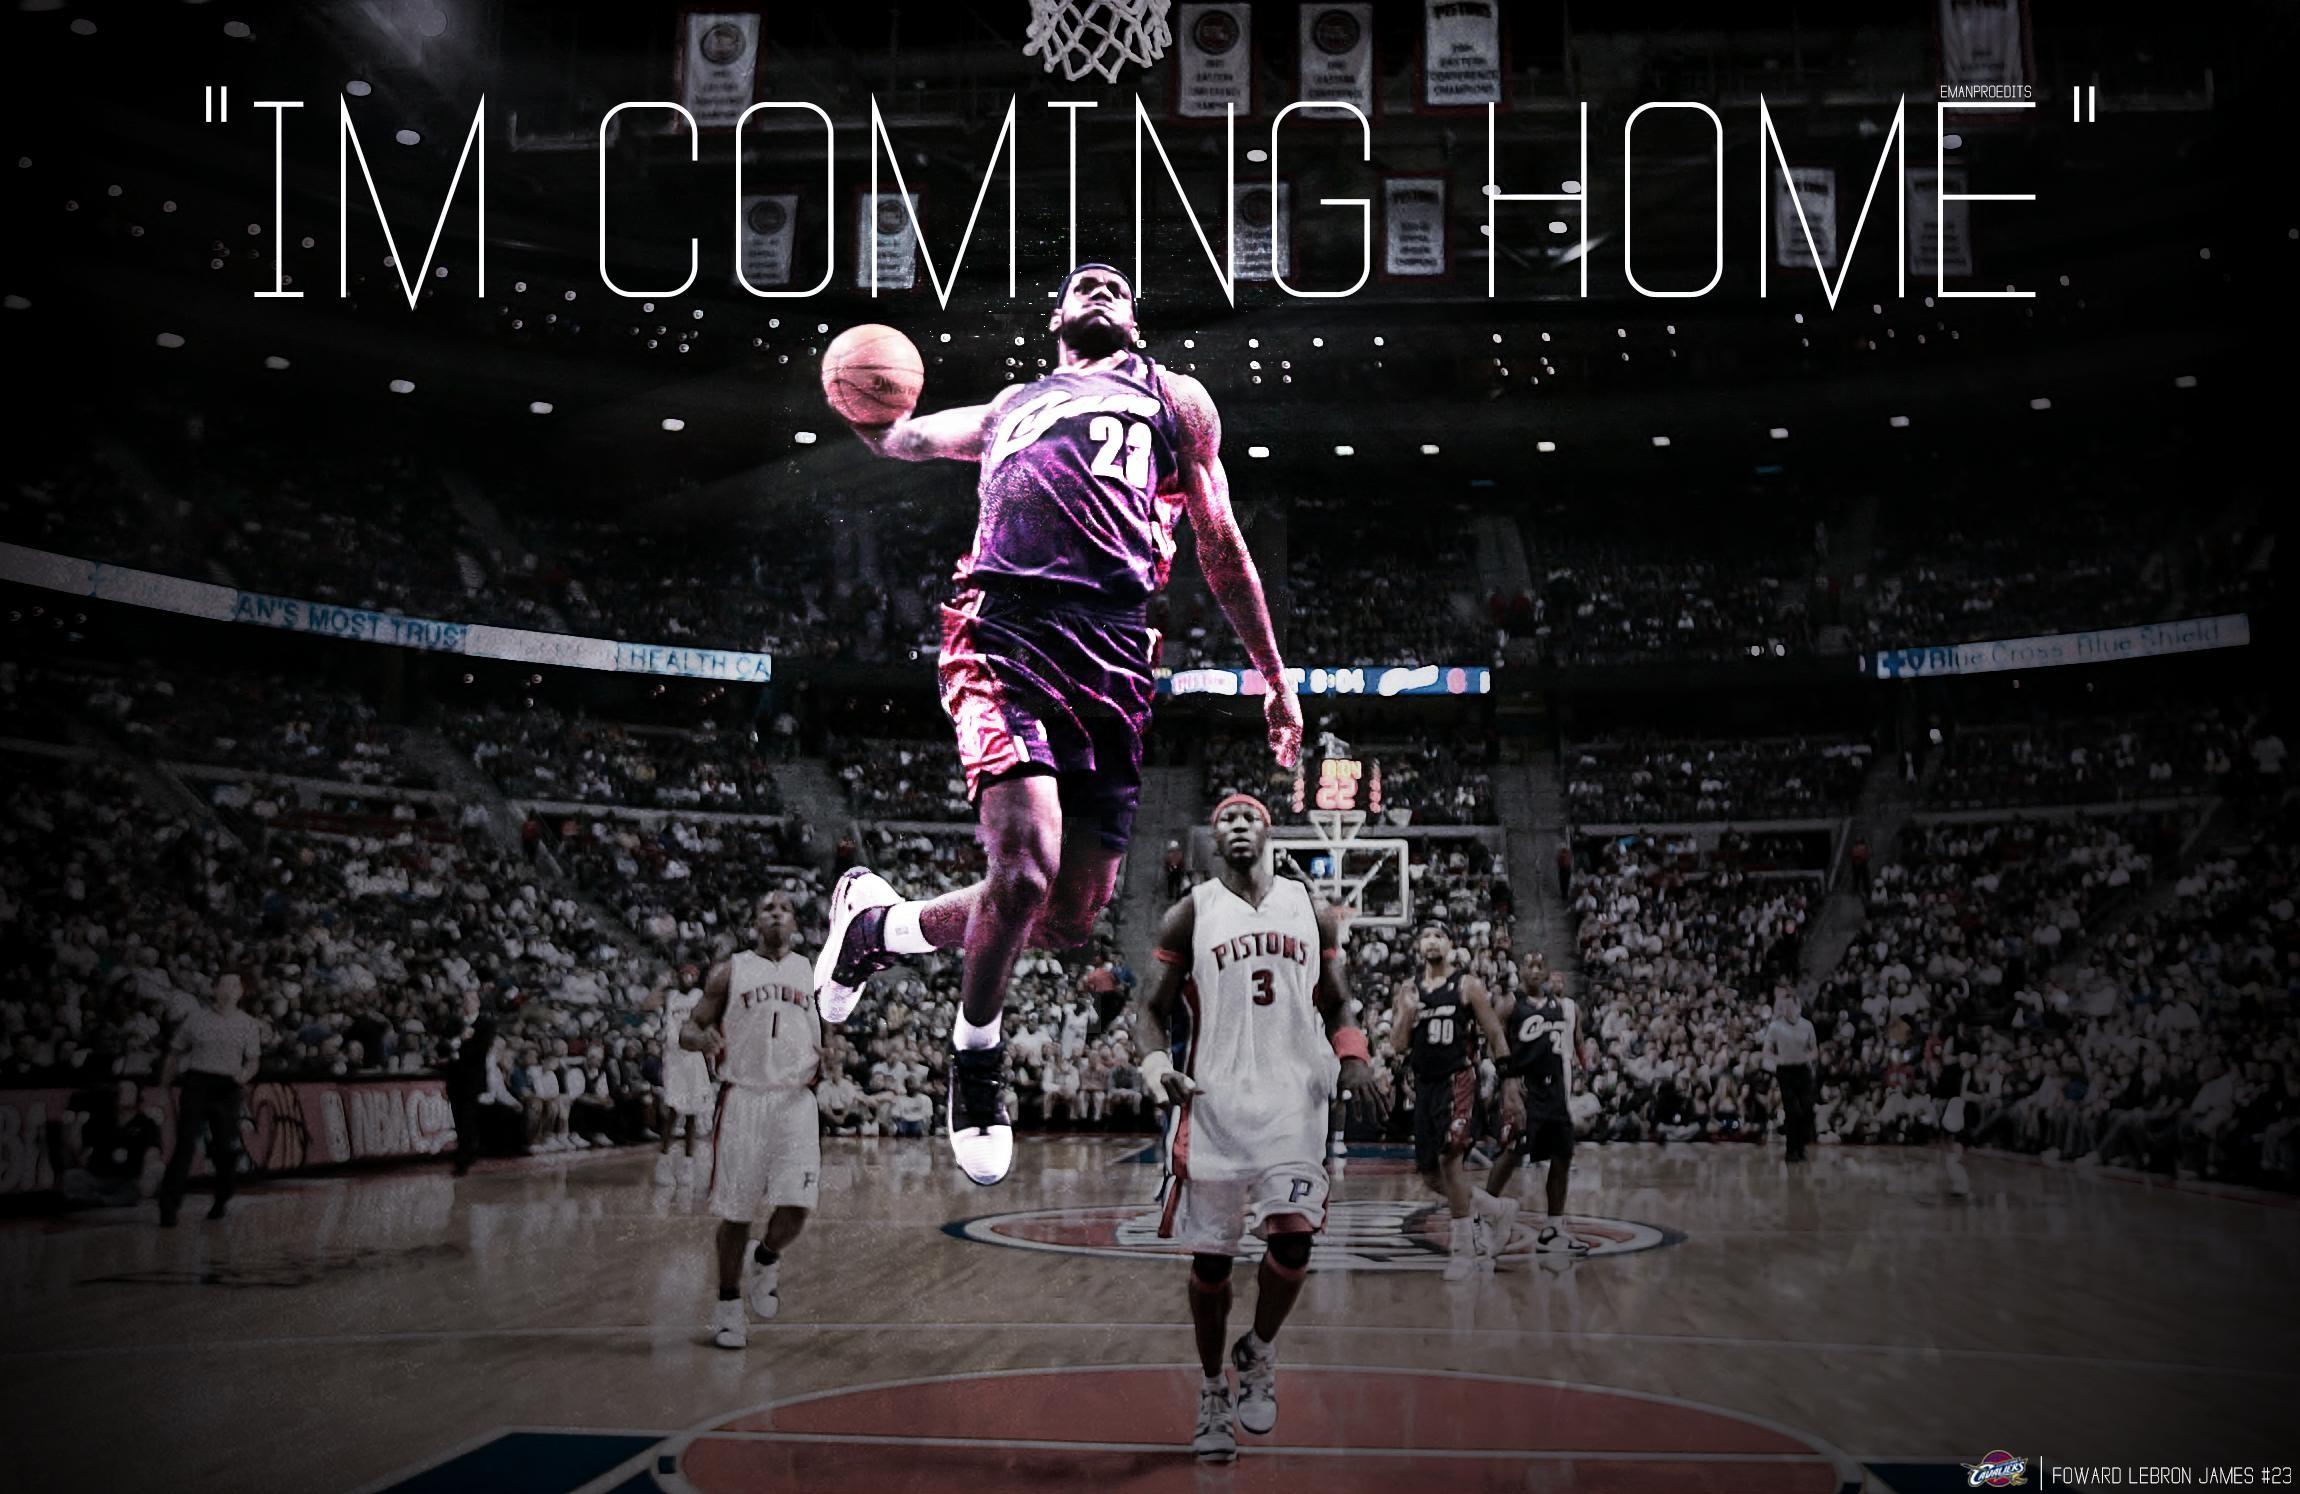 Lebron James Miami Heat Backgrounds